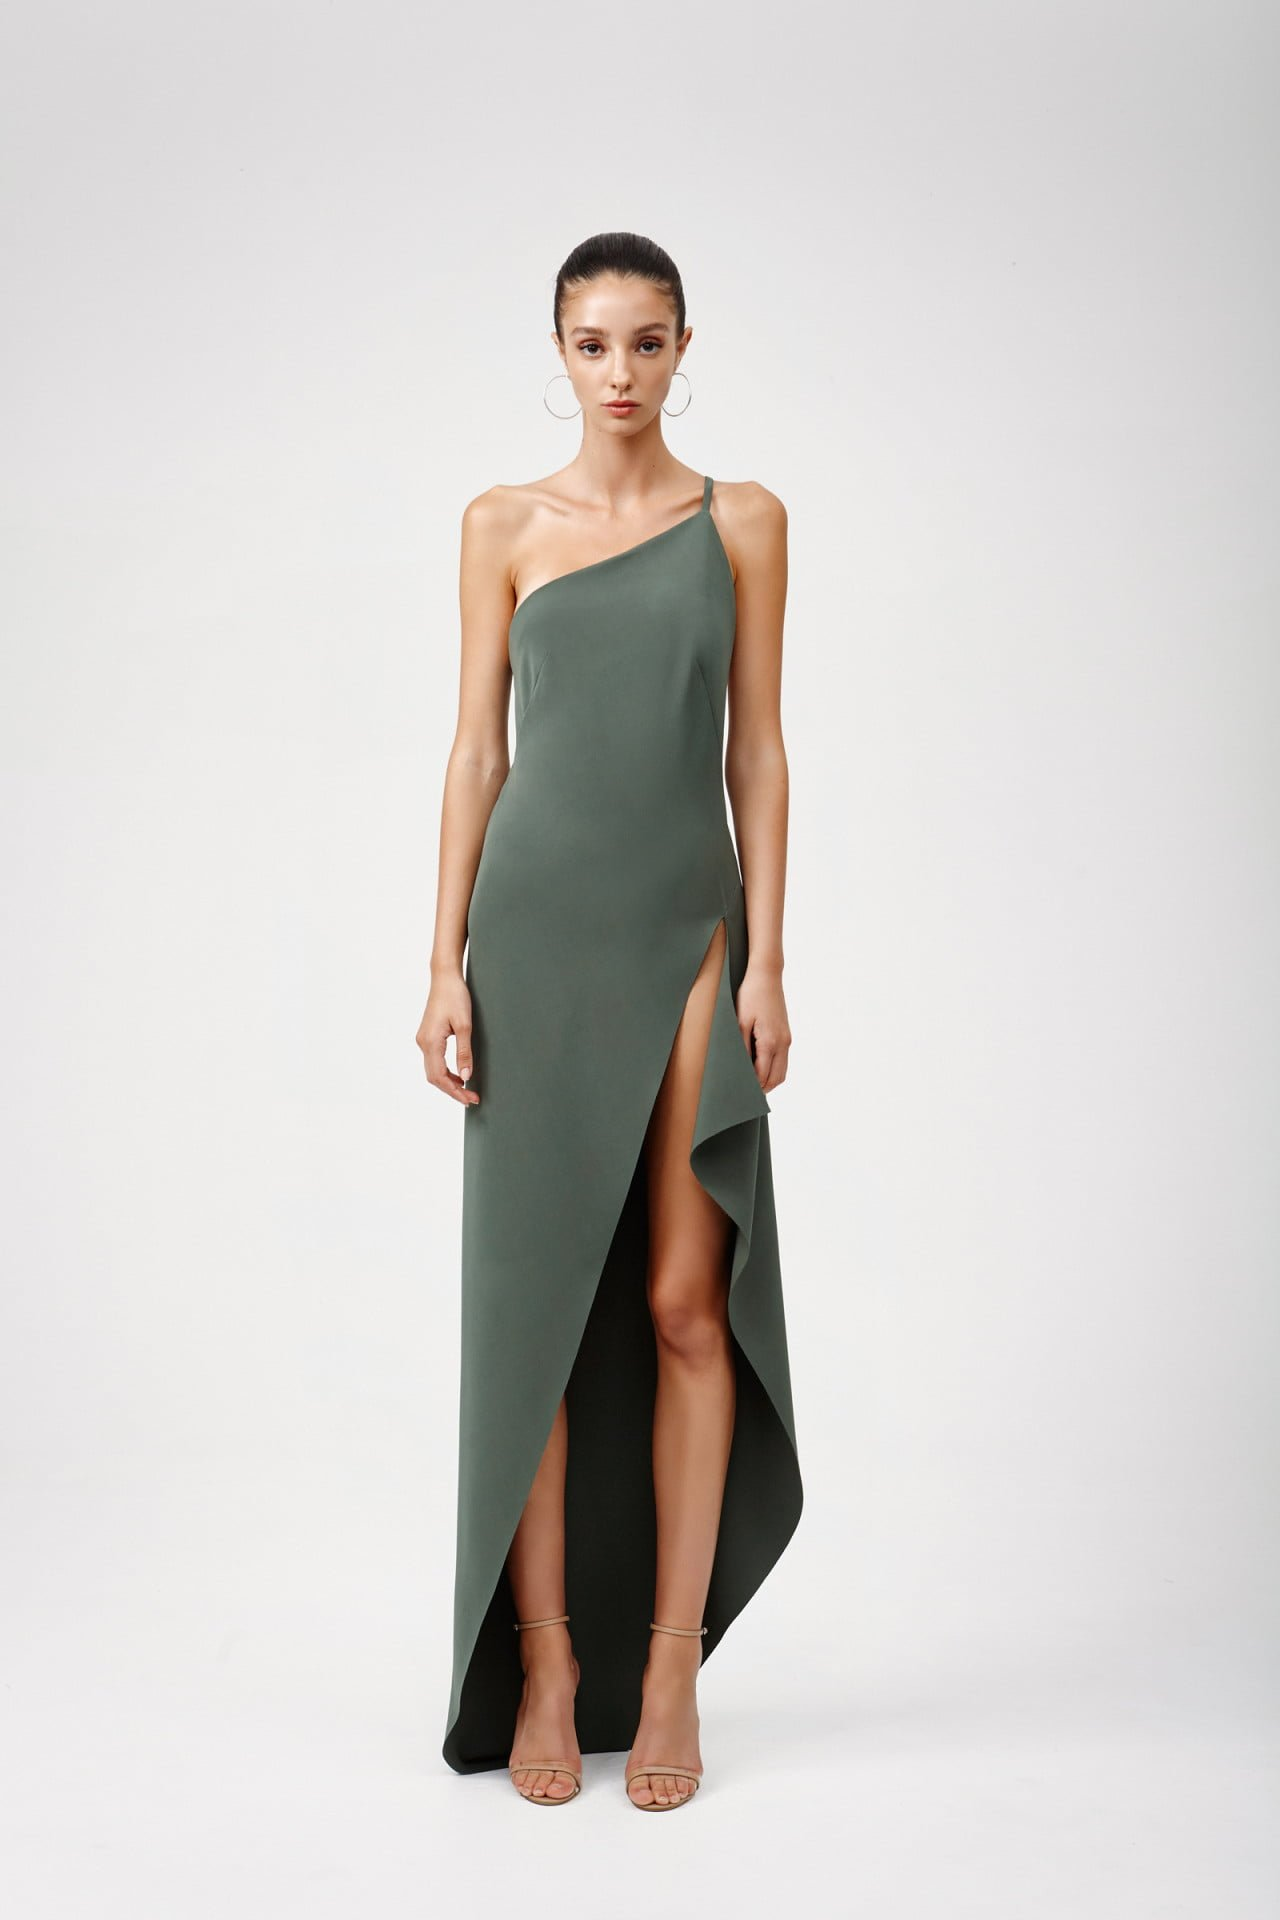 Lexi Lina Dress Khaki Ons Boutique